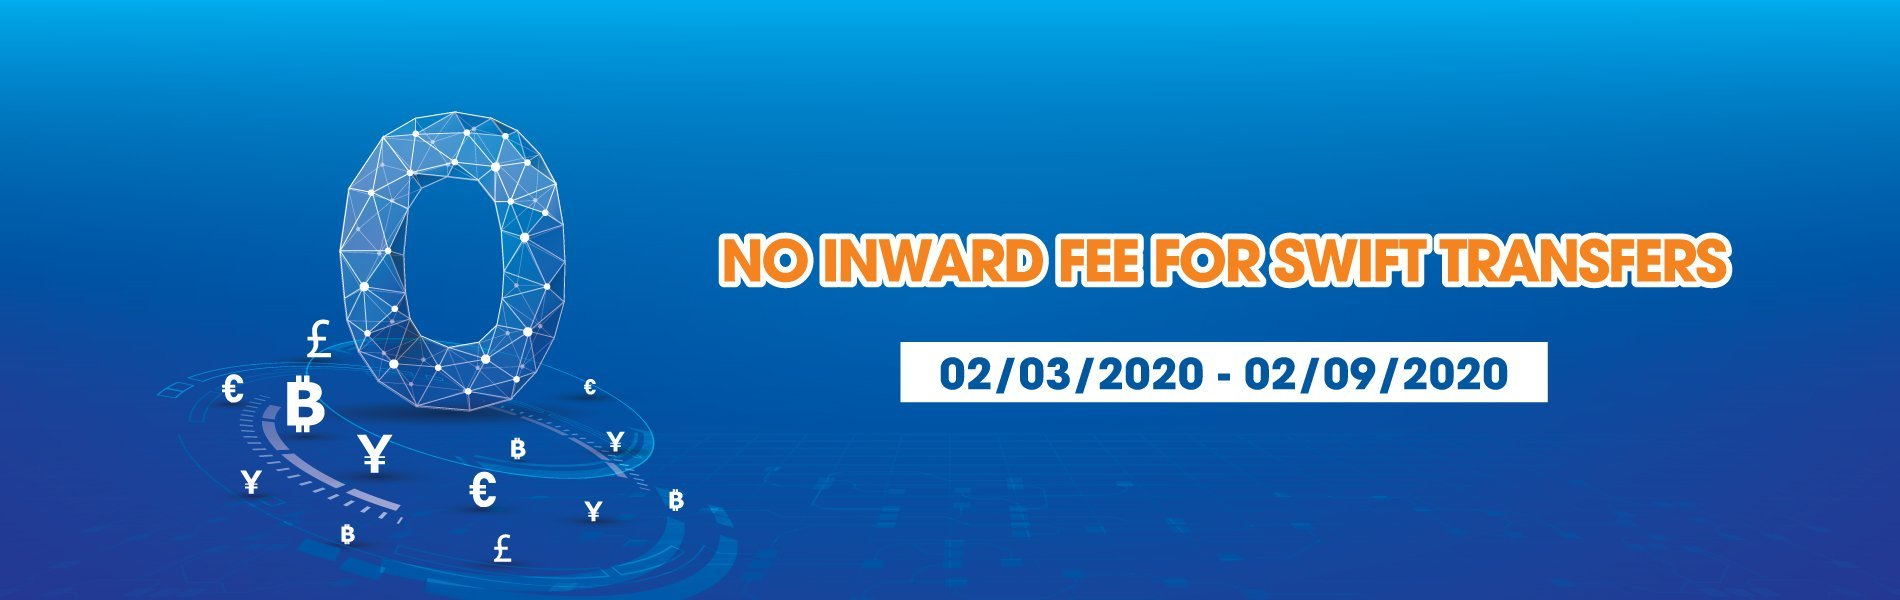 No Inward Fee